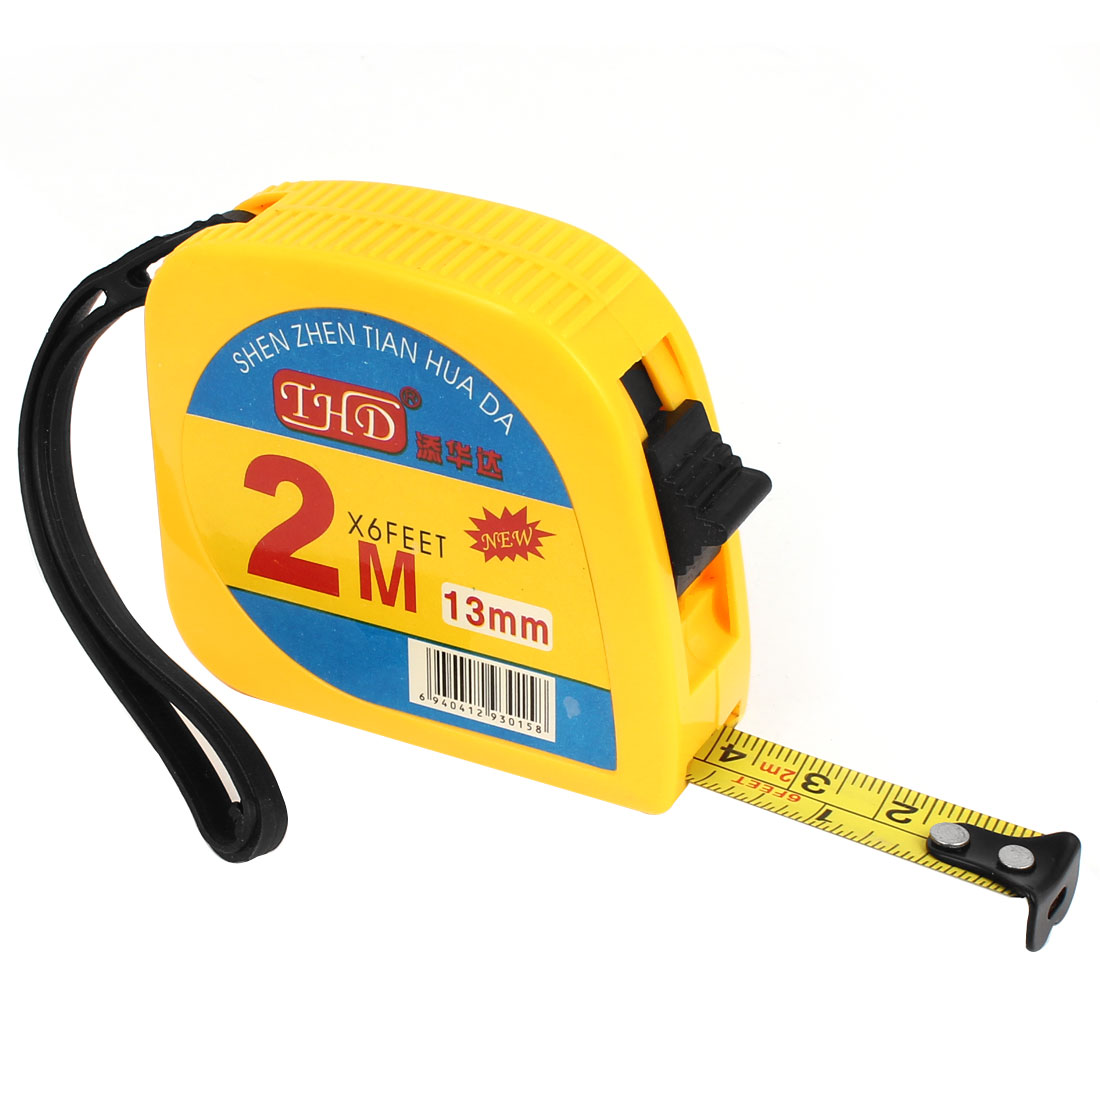 Plastic Housing 2 Meter Measuring Range 12mm Wide Metal Ruler Tape Yellow